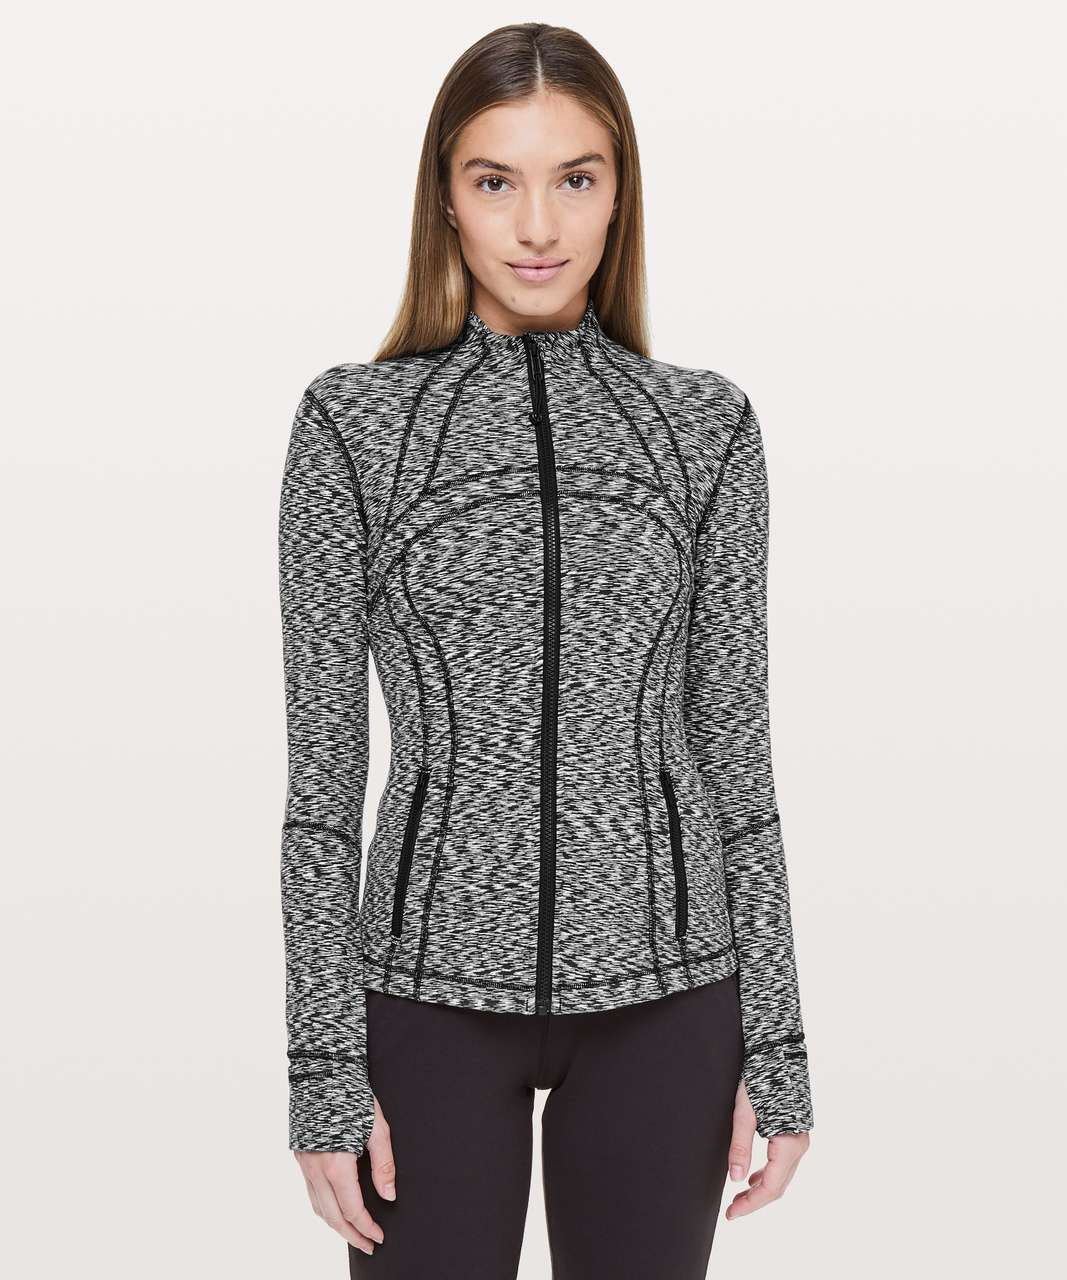 Lululemon Define Jacket *Rulu - Spaced Out Space Dye Black White